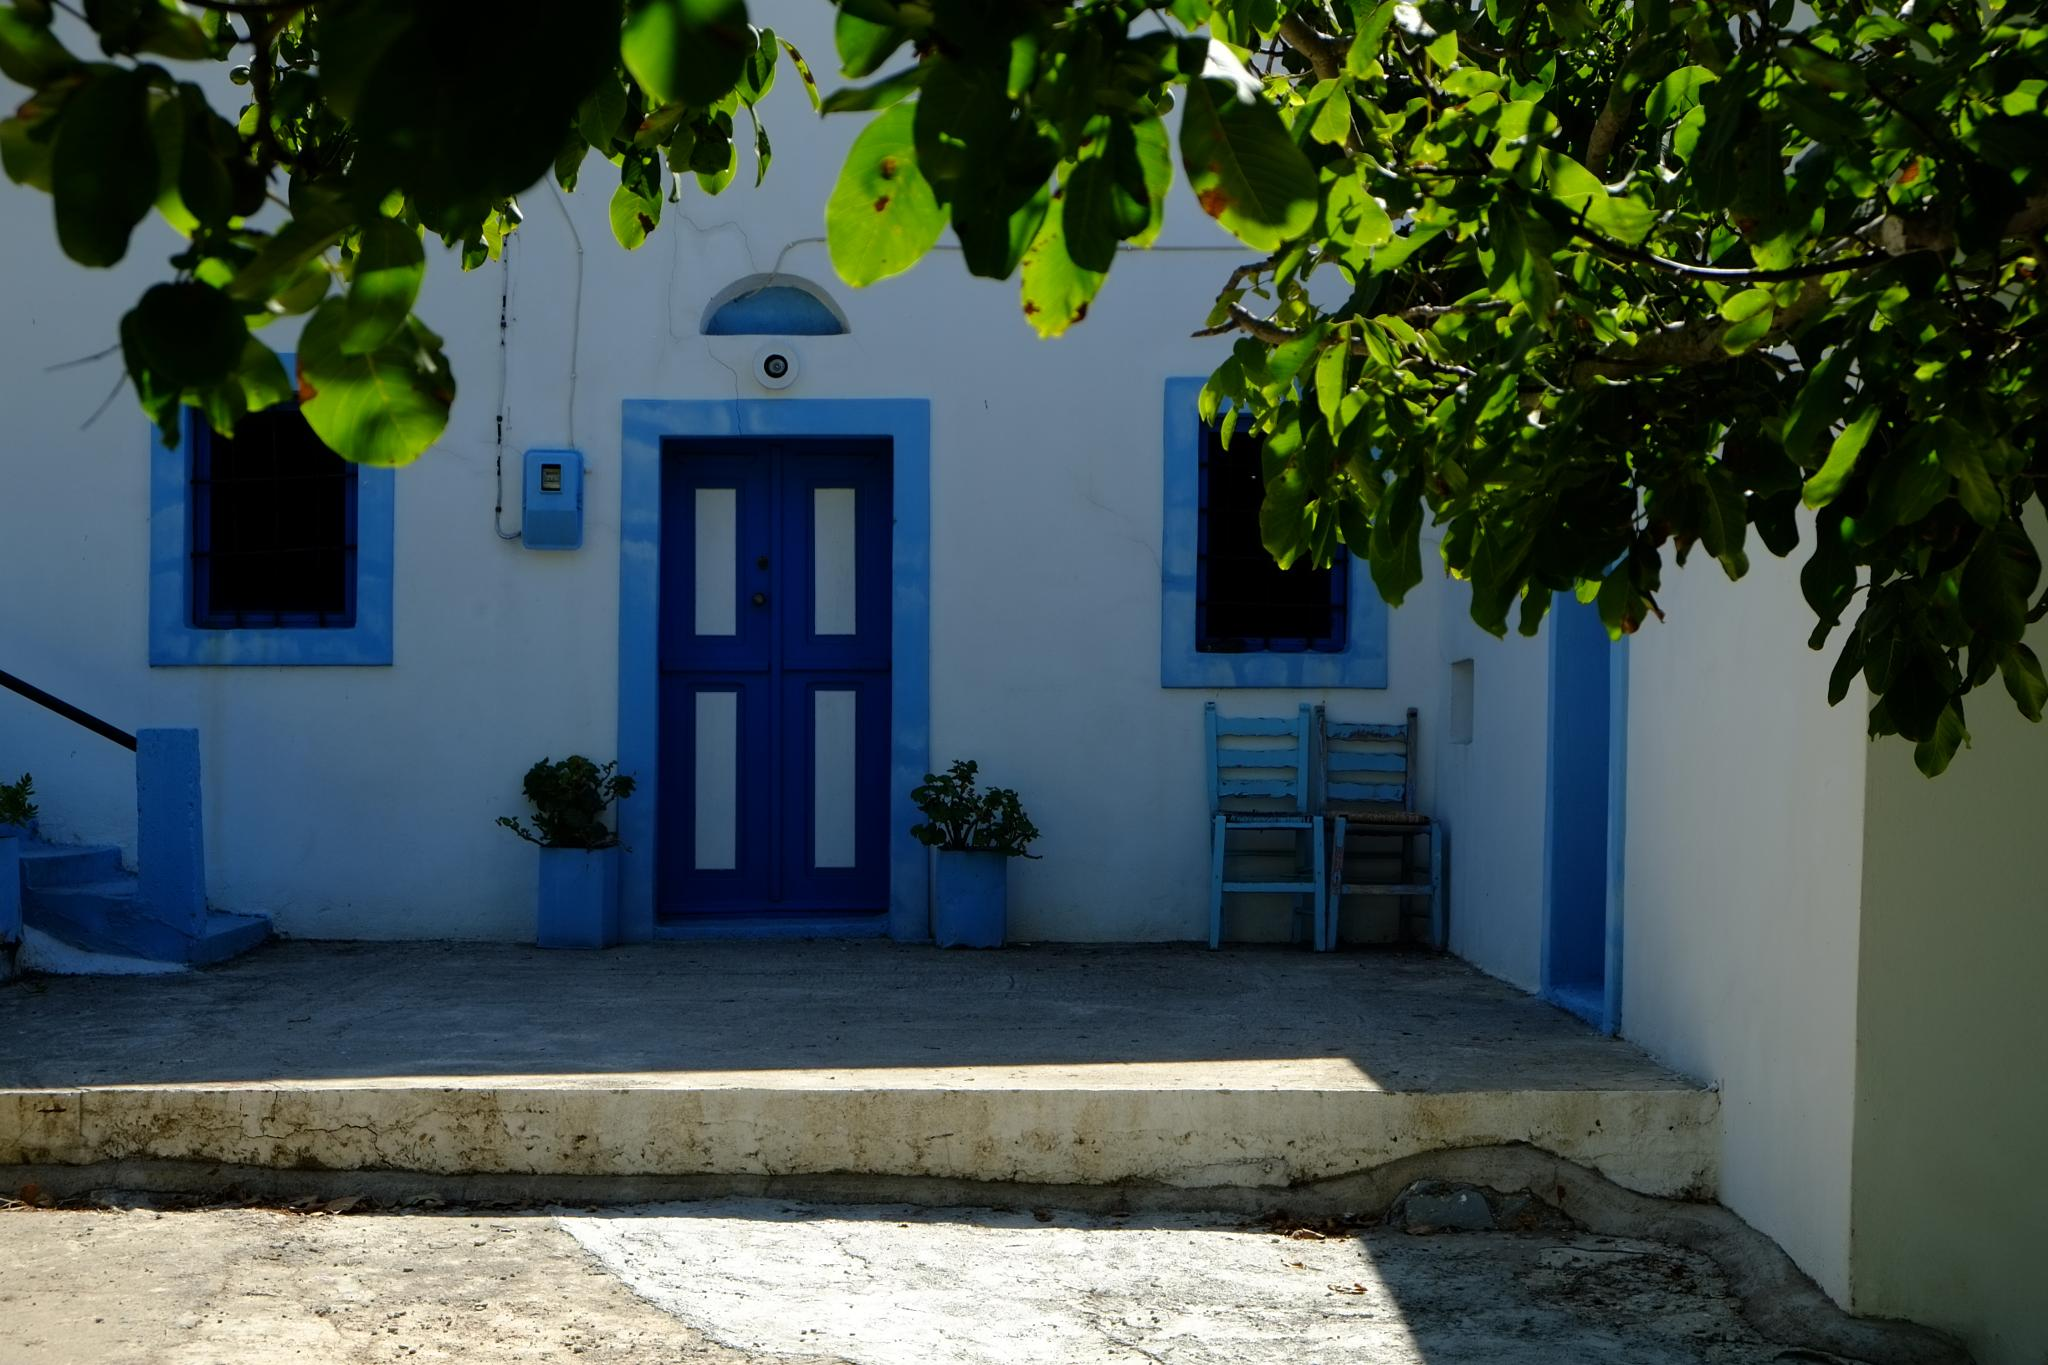 Greece by peterkryzun